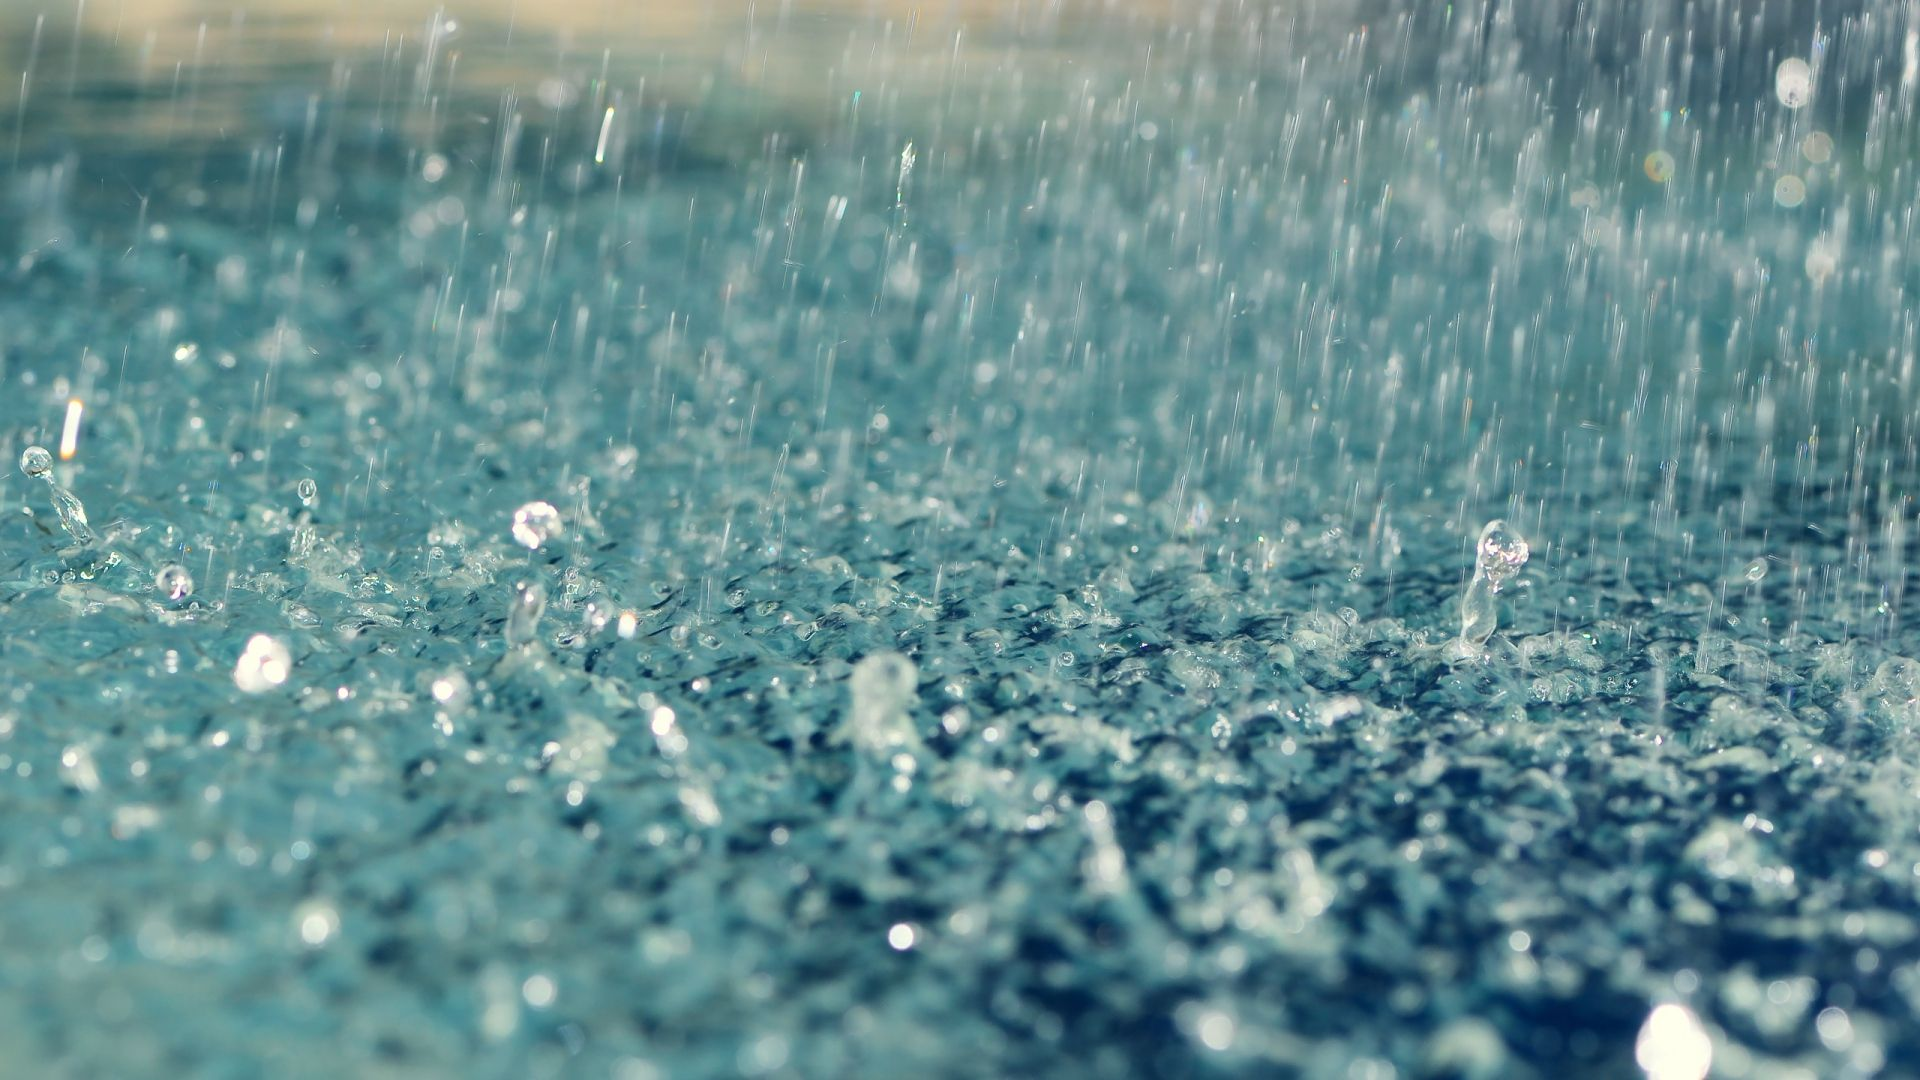 Hd wallpaper rain - Beautiful Rain Pics Most Beautiful Rain Wallpapers For Your